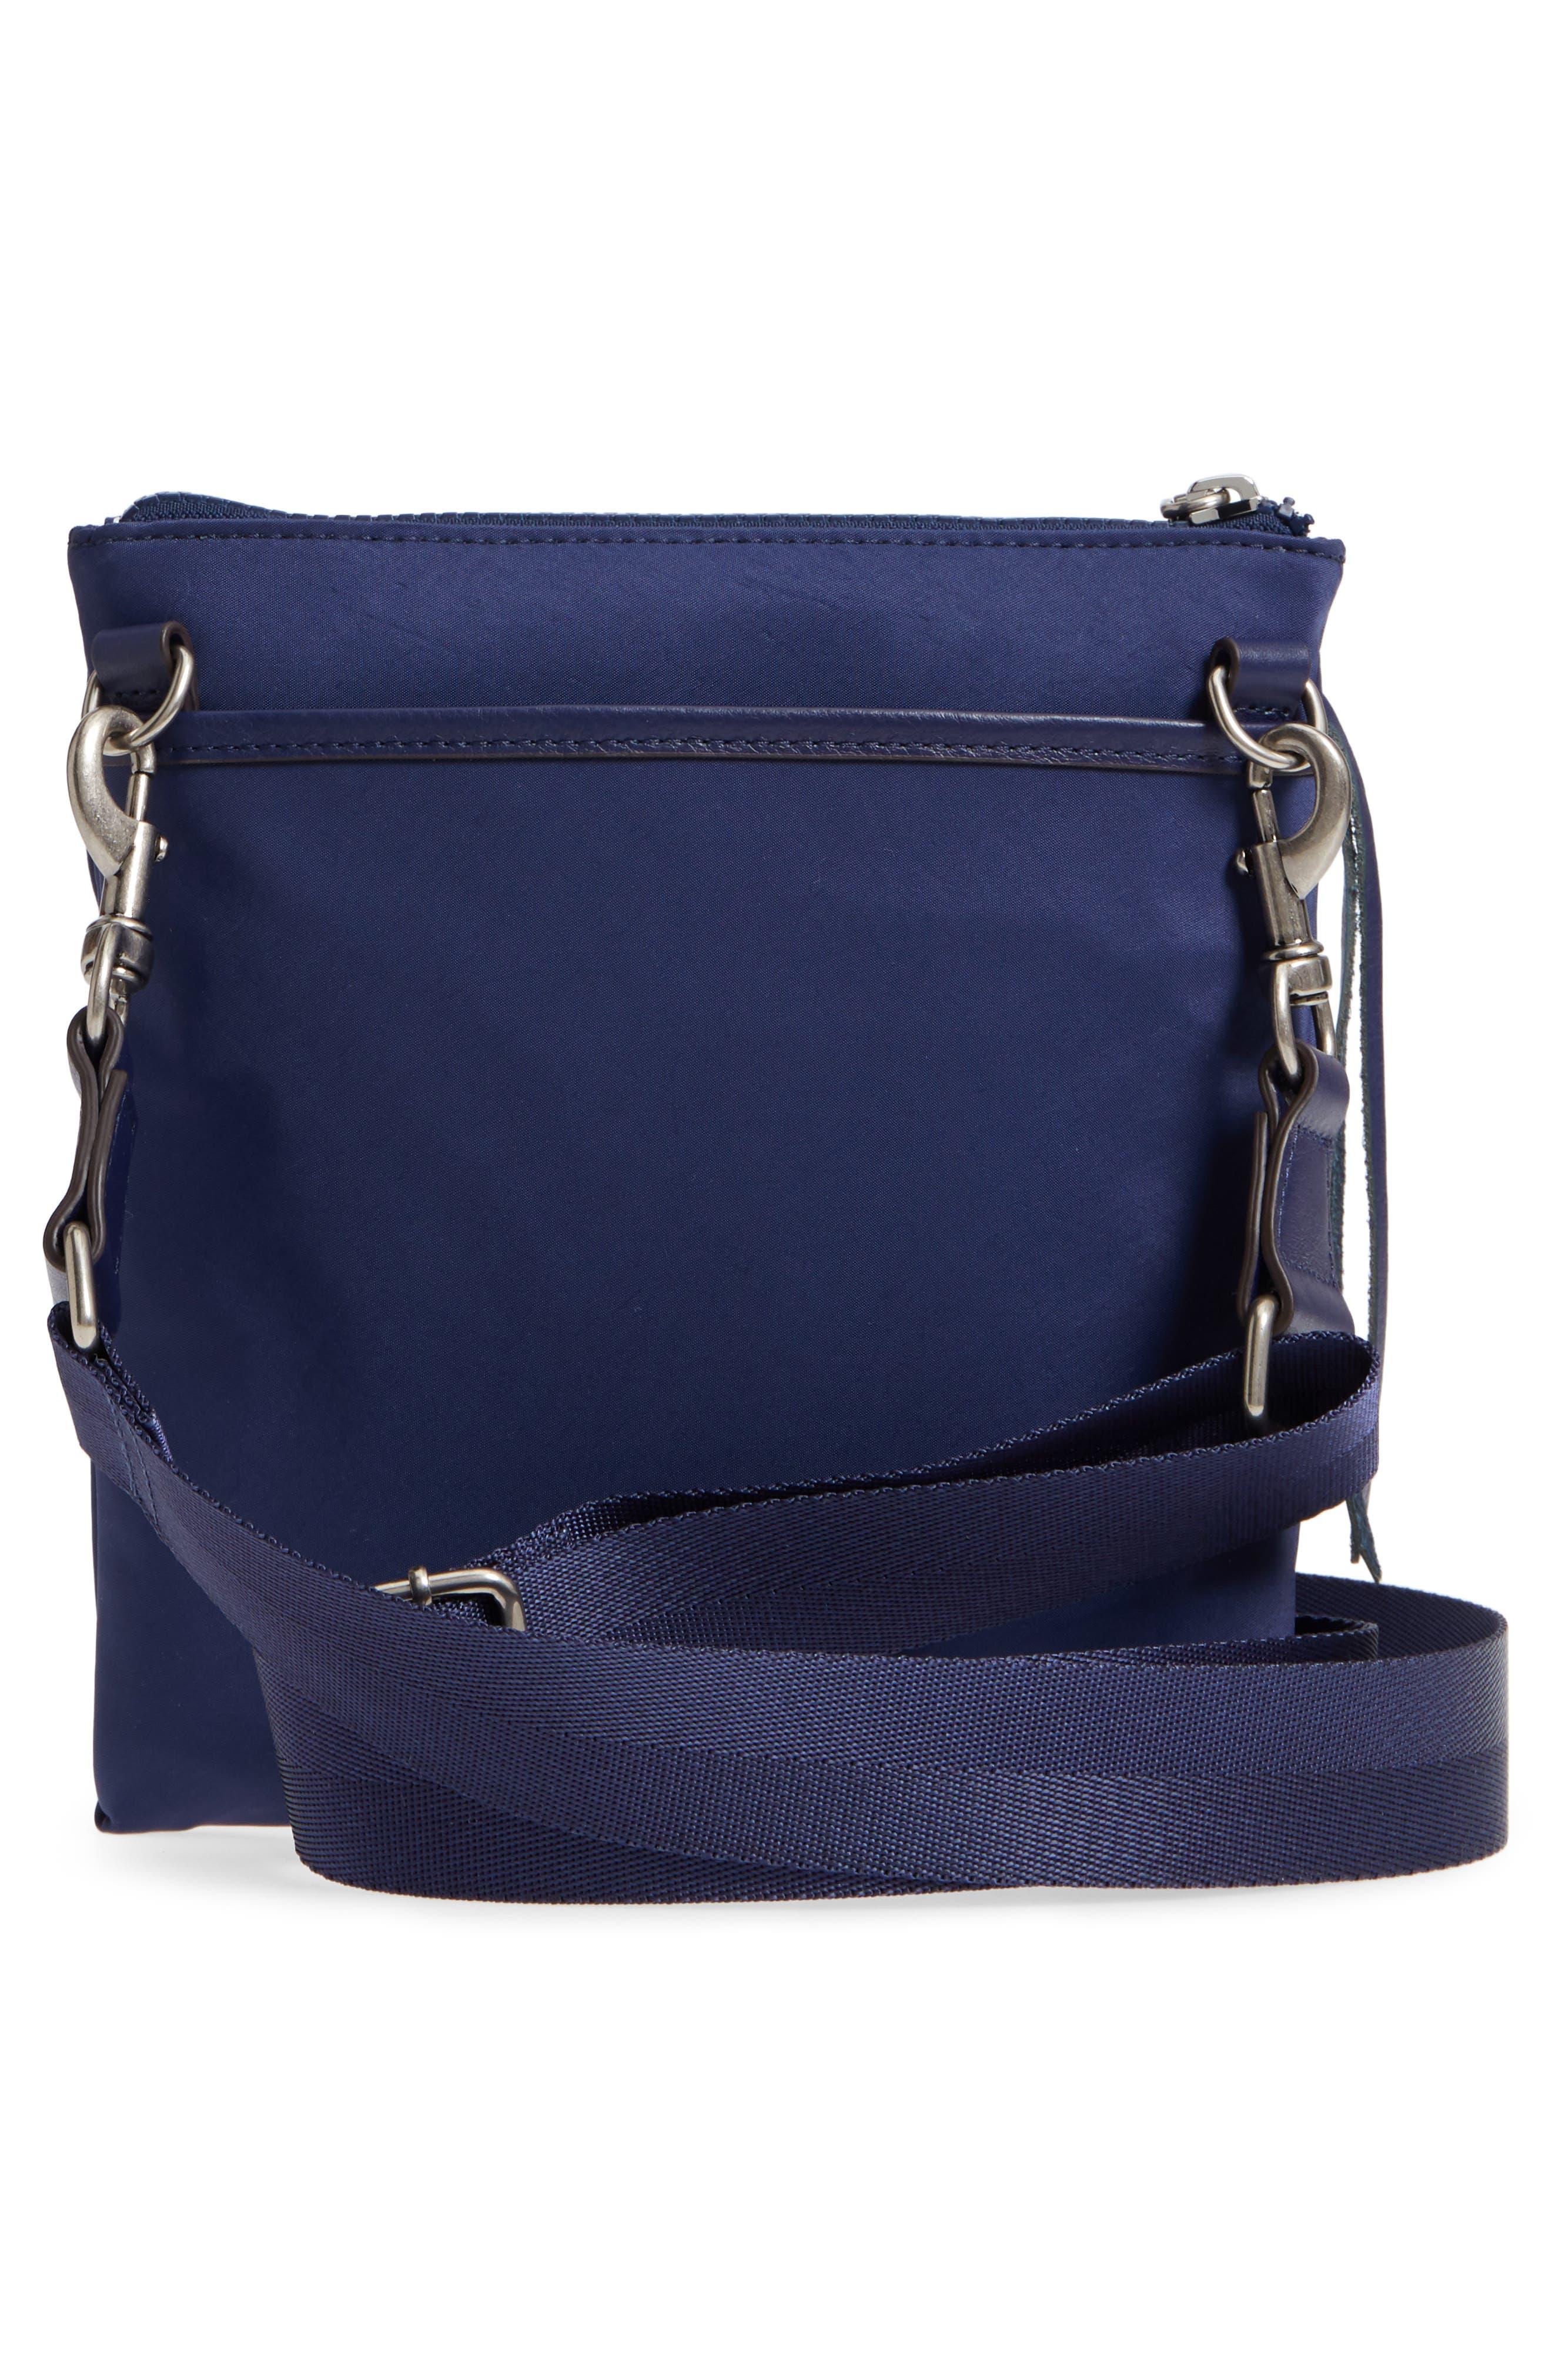 Nylon Flap Crossbody Bag,                             Alternate thumbnail 3, color,                             True Navy